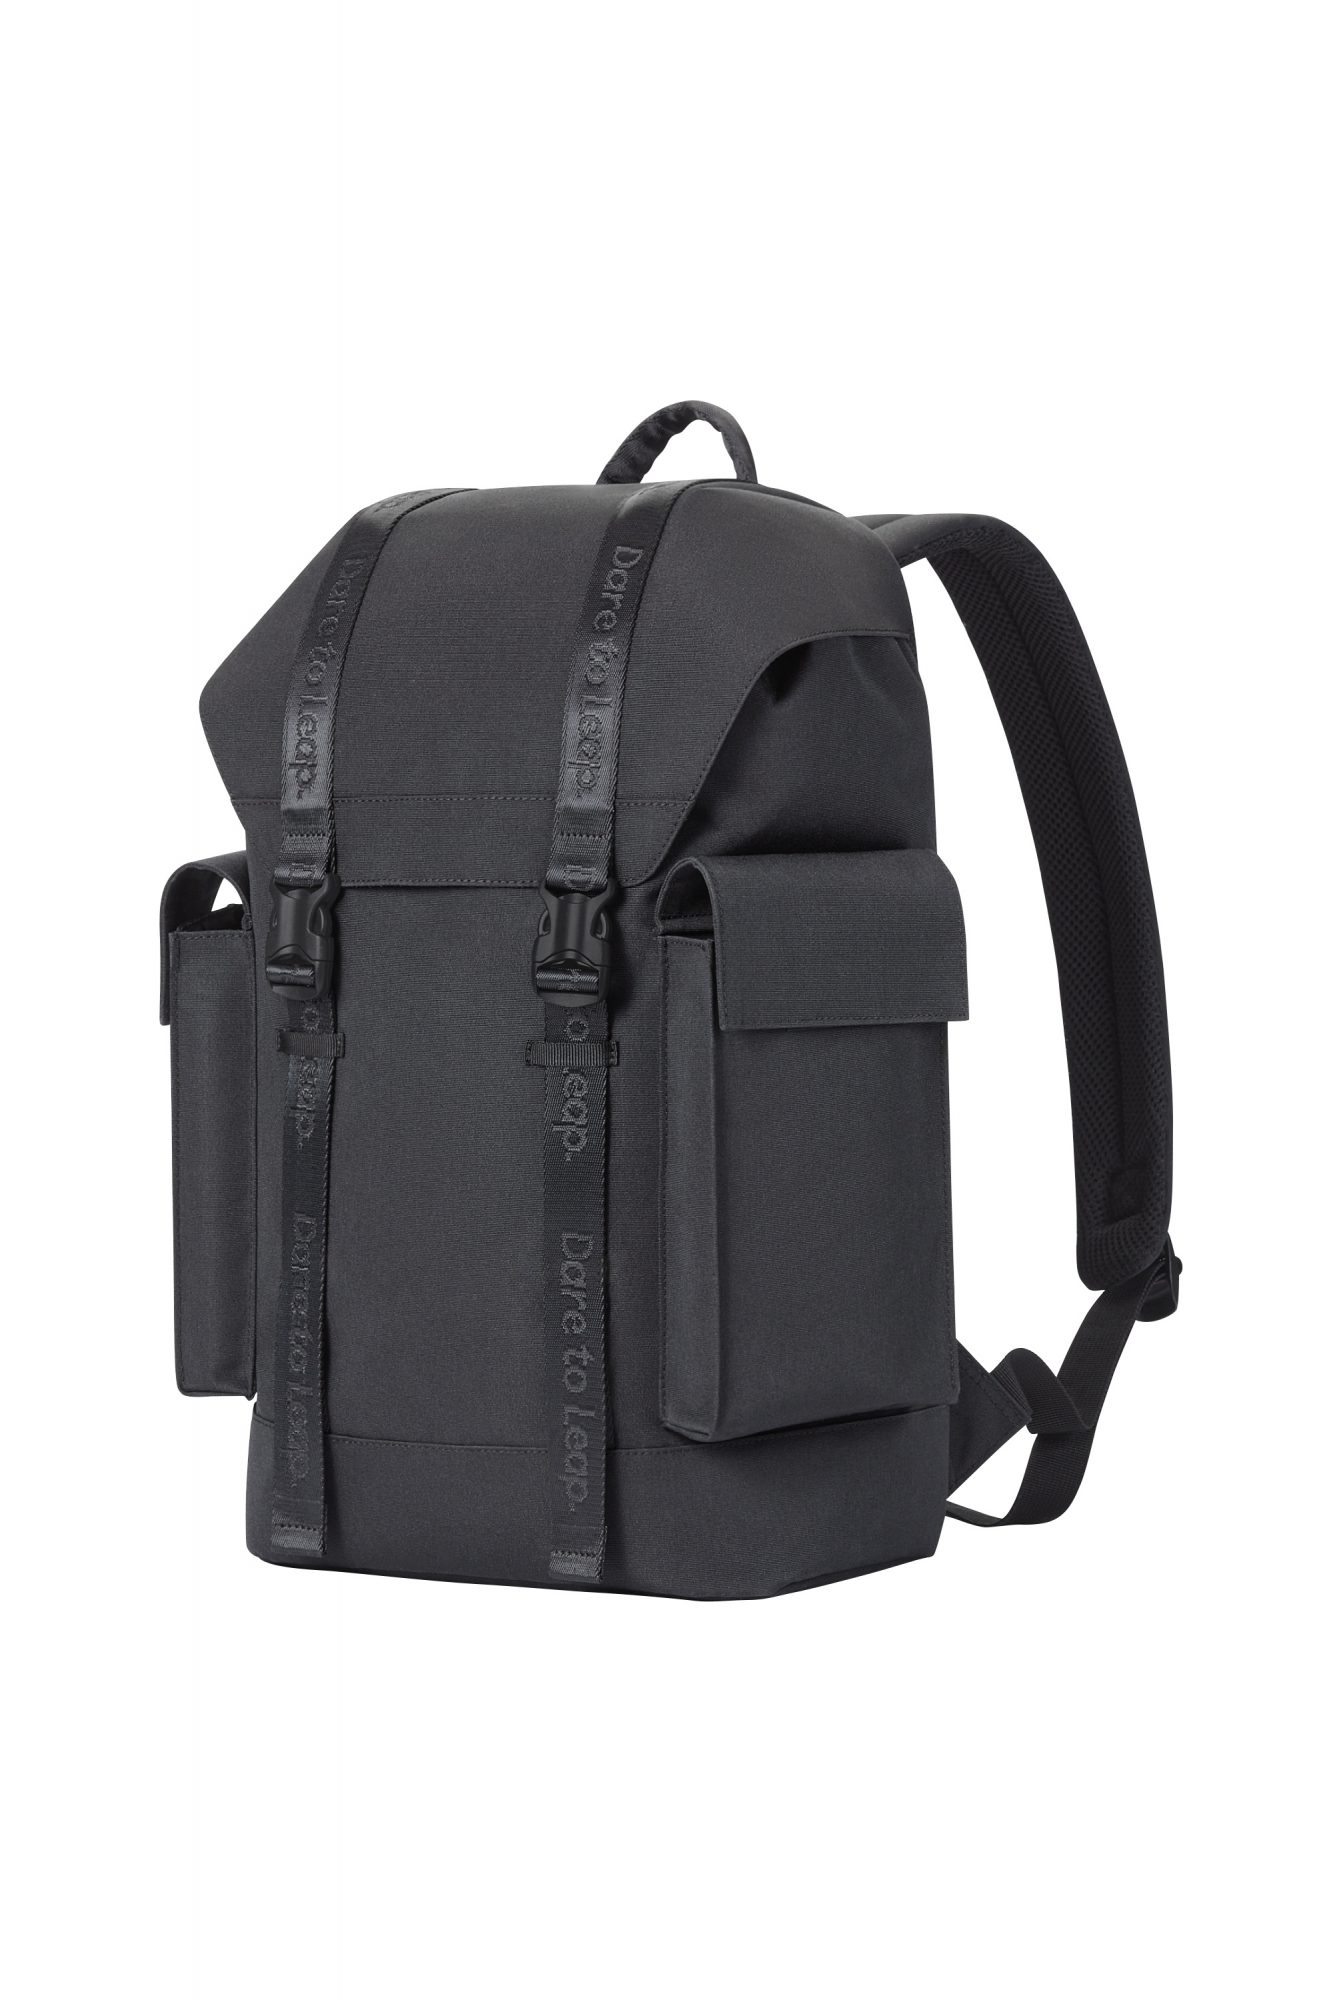 realme Adventure Backpack 2